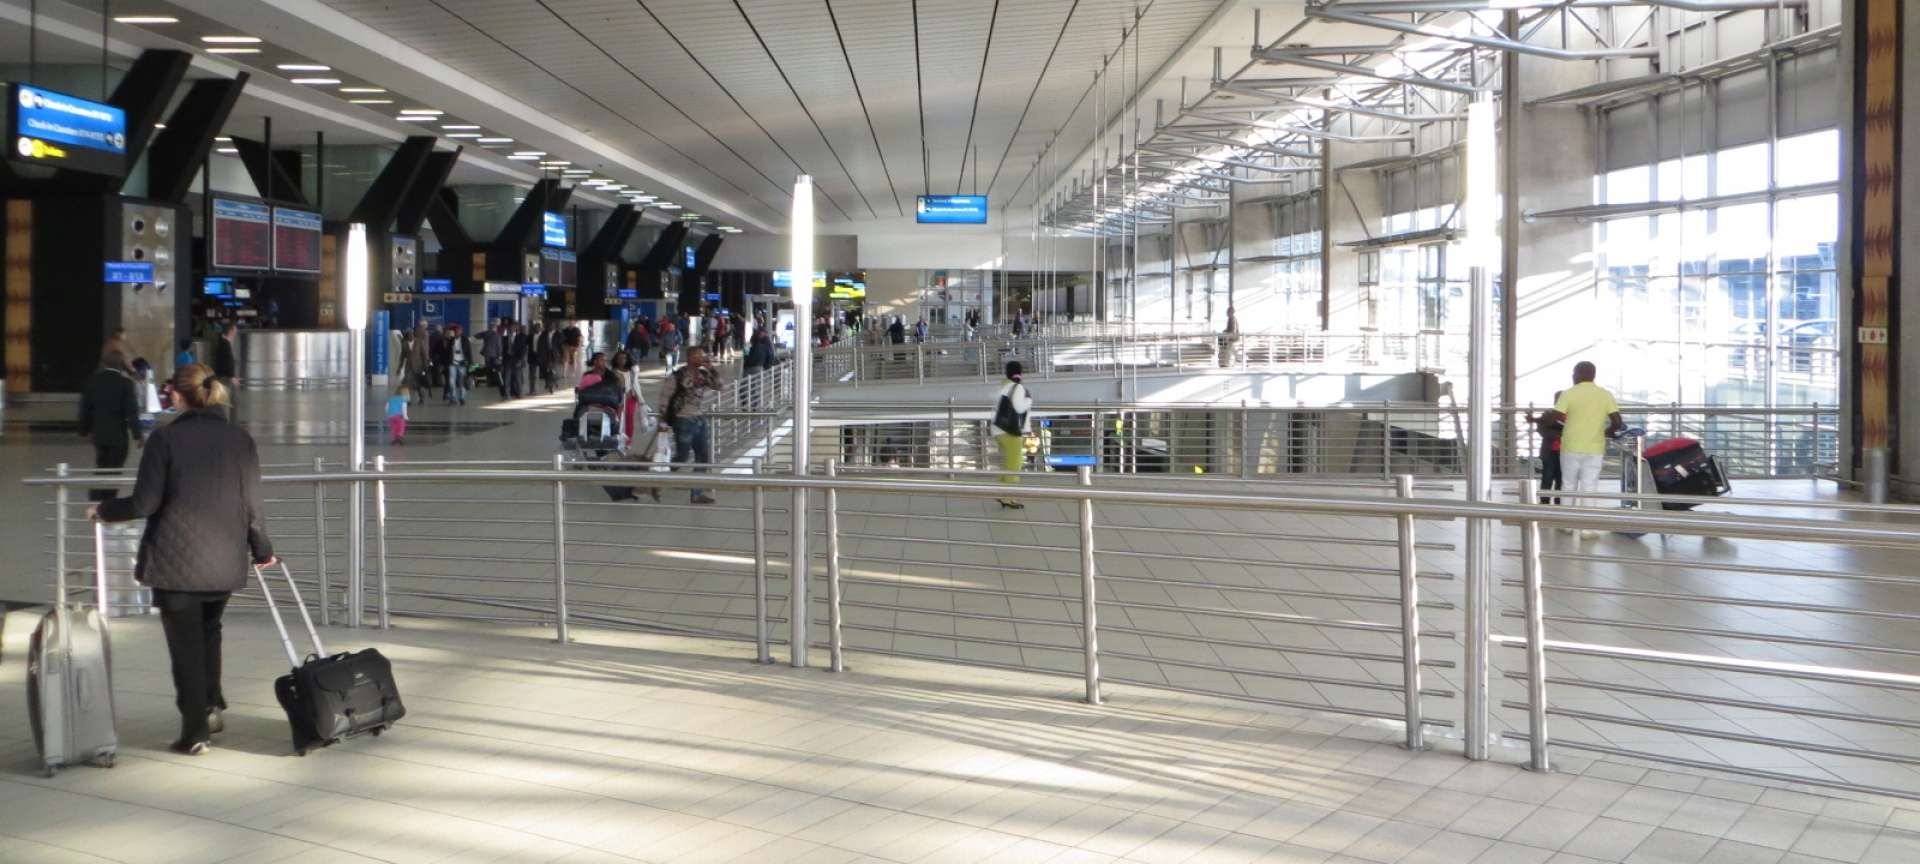 OR Tambo International Airport, Johannesburg - Africa Wildlife Safaris